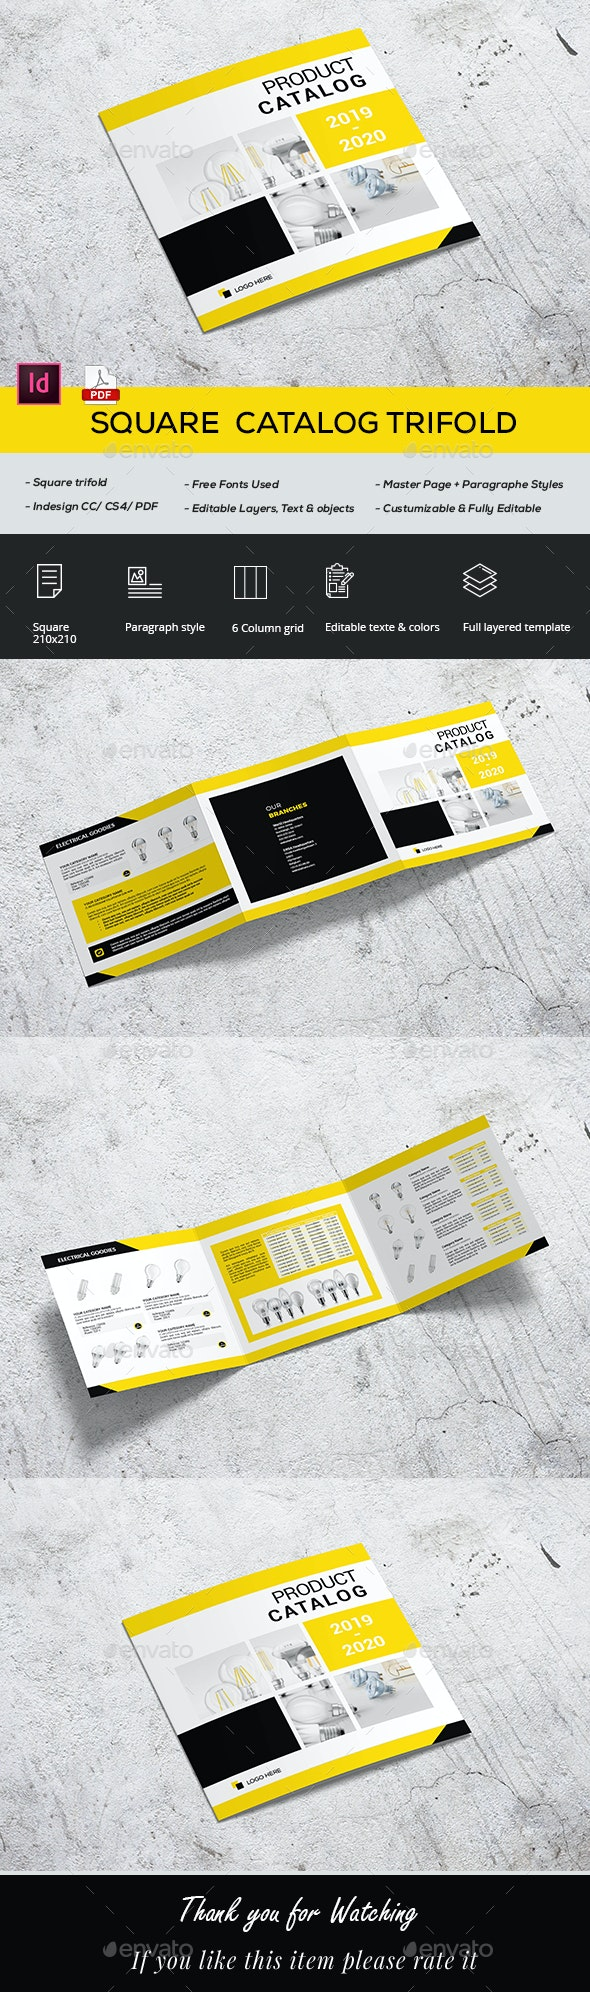 Square Catalog Trifold - Catalogs Brochures